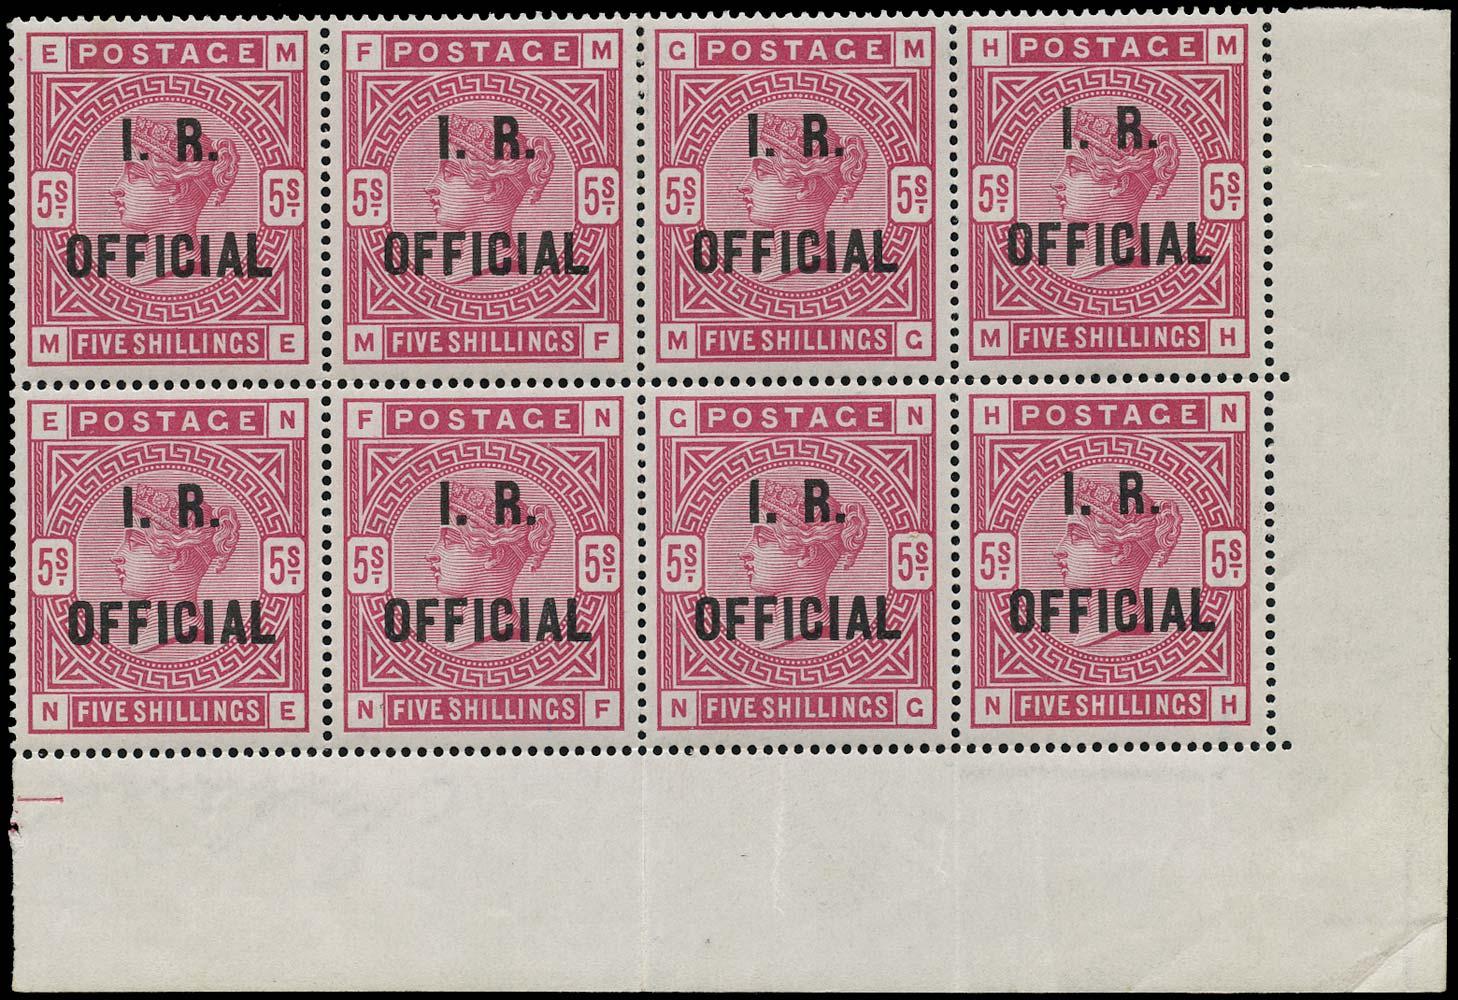 GB 1890  SGO9 Official (I.R. Official) U/M block eight